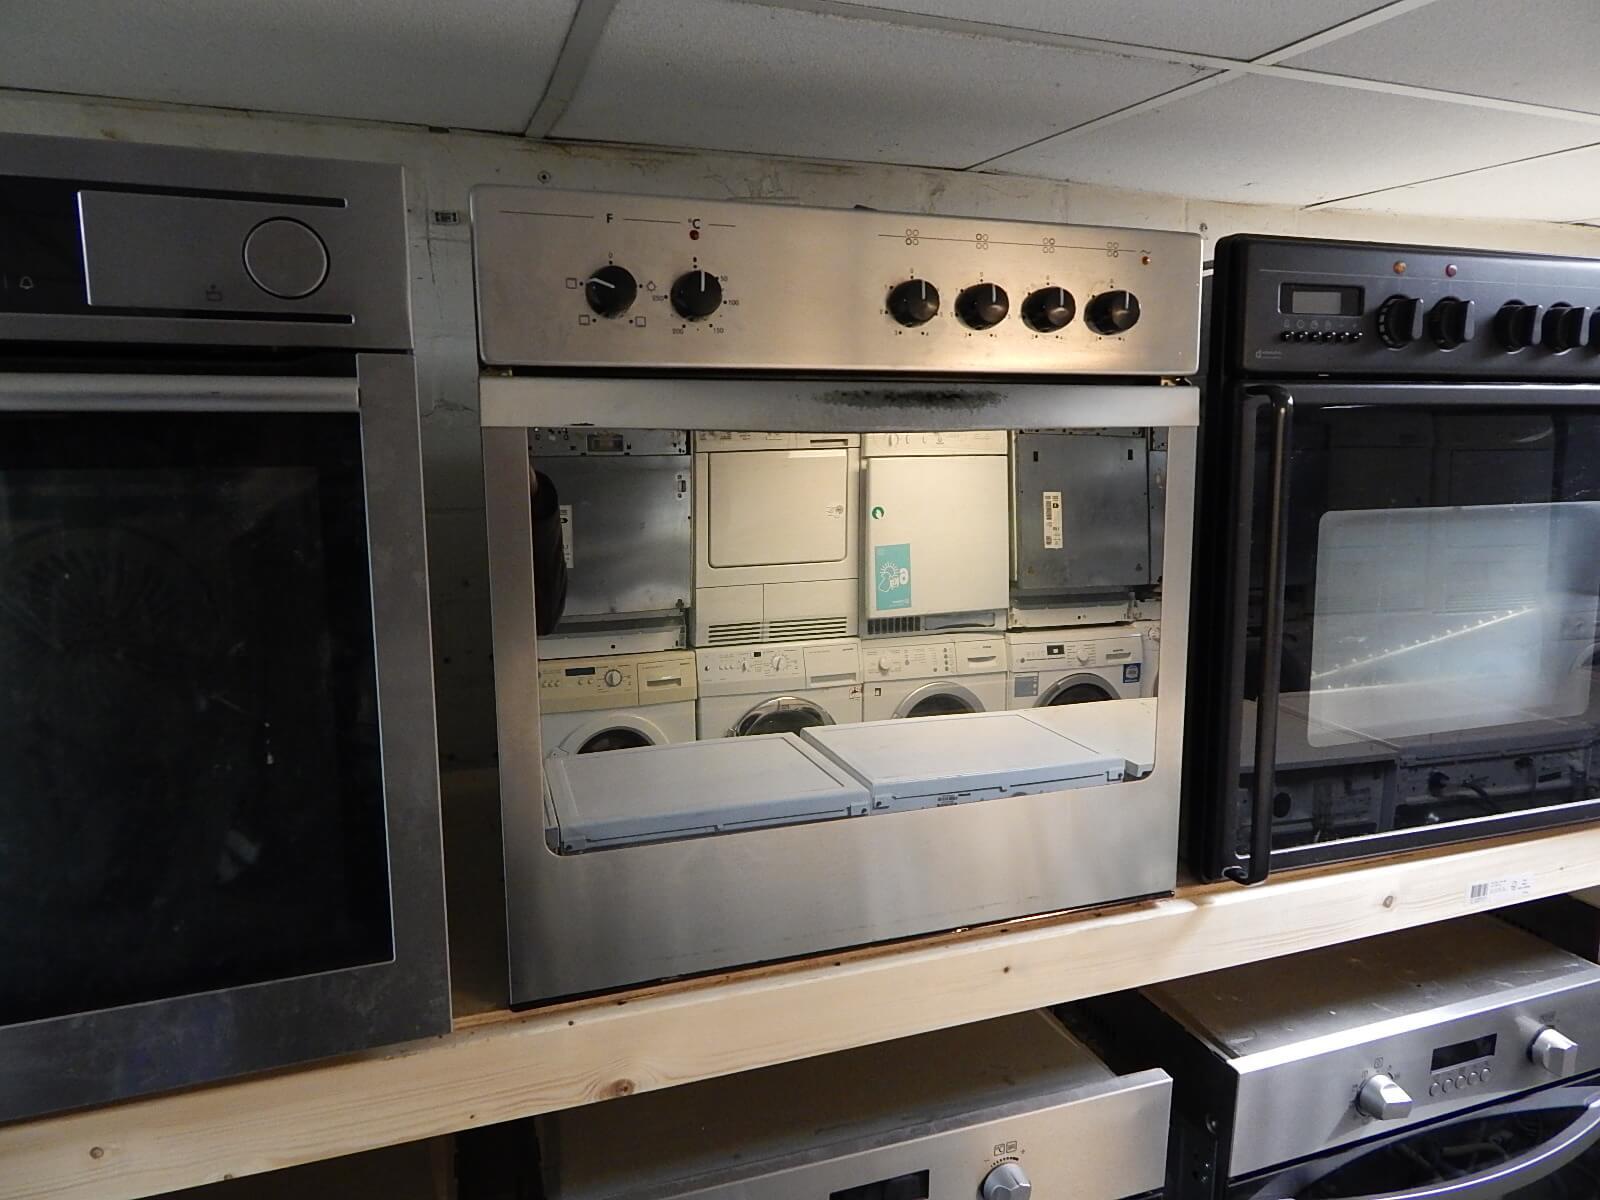 Goedkope 2e hands oven